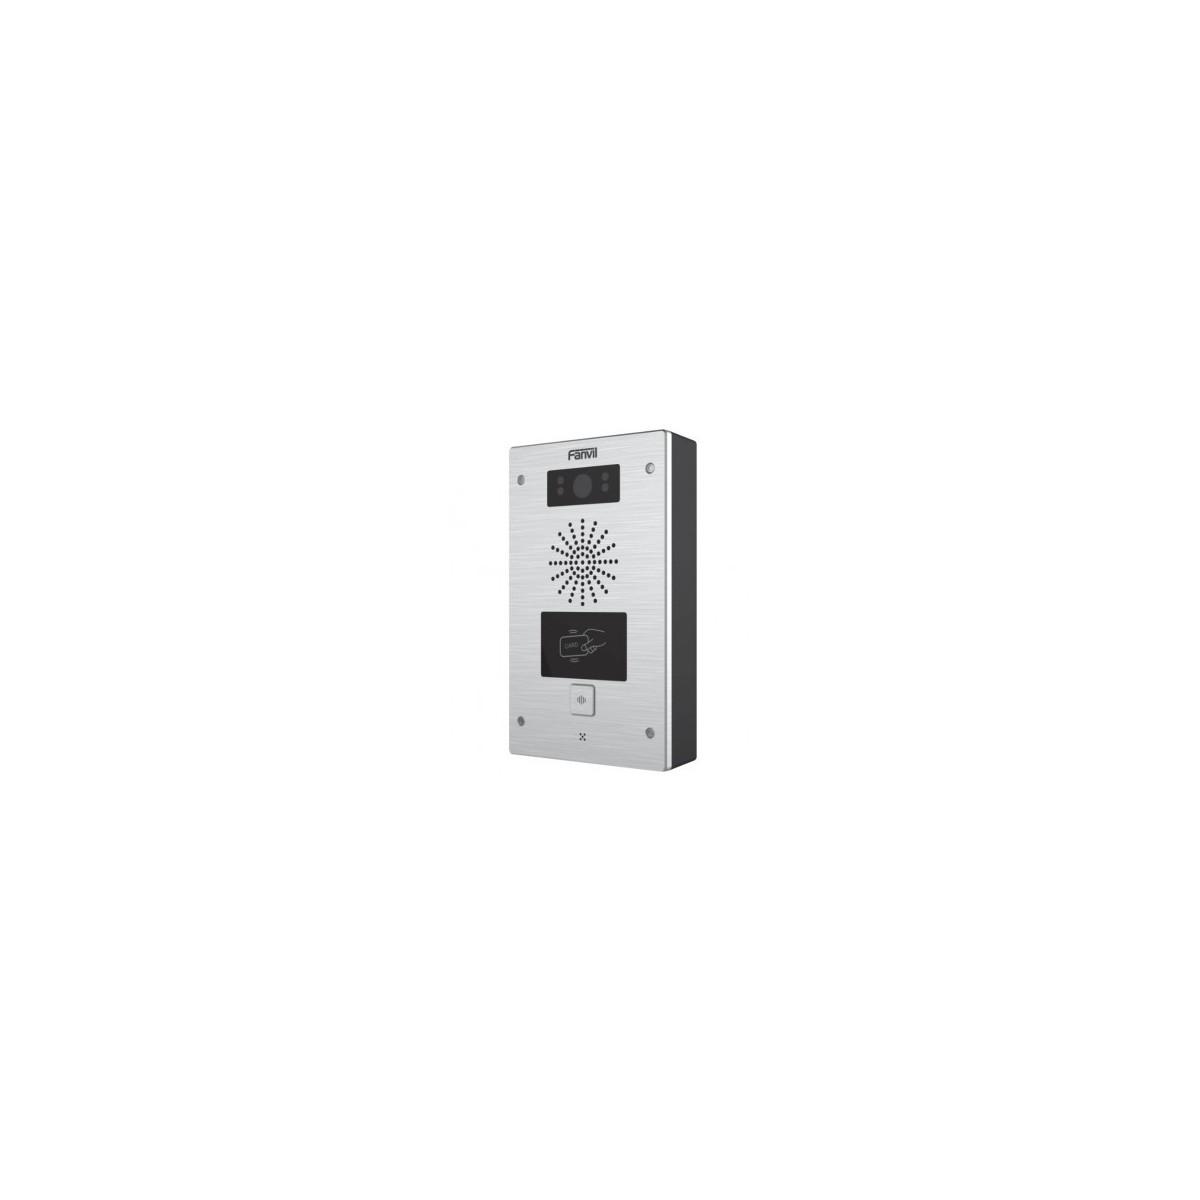 Citofono Fanvil i32V videocitofono IP IP65 RFID antivandalo IK10